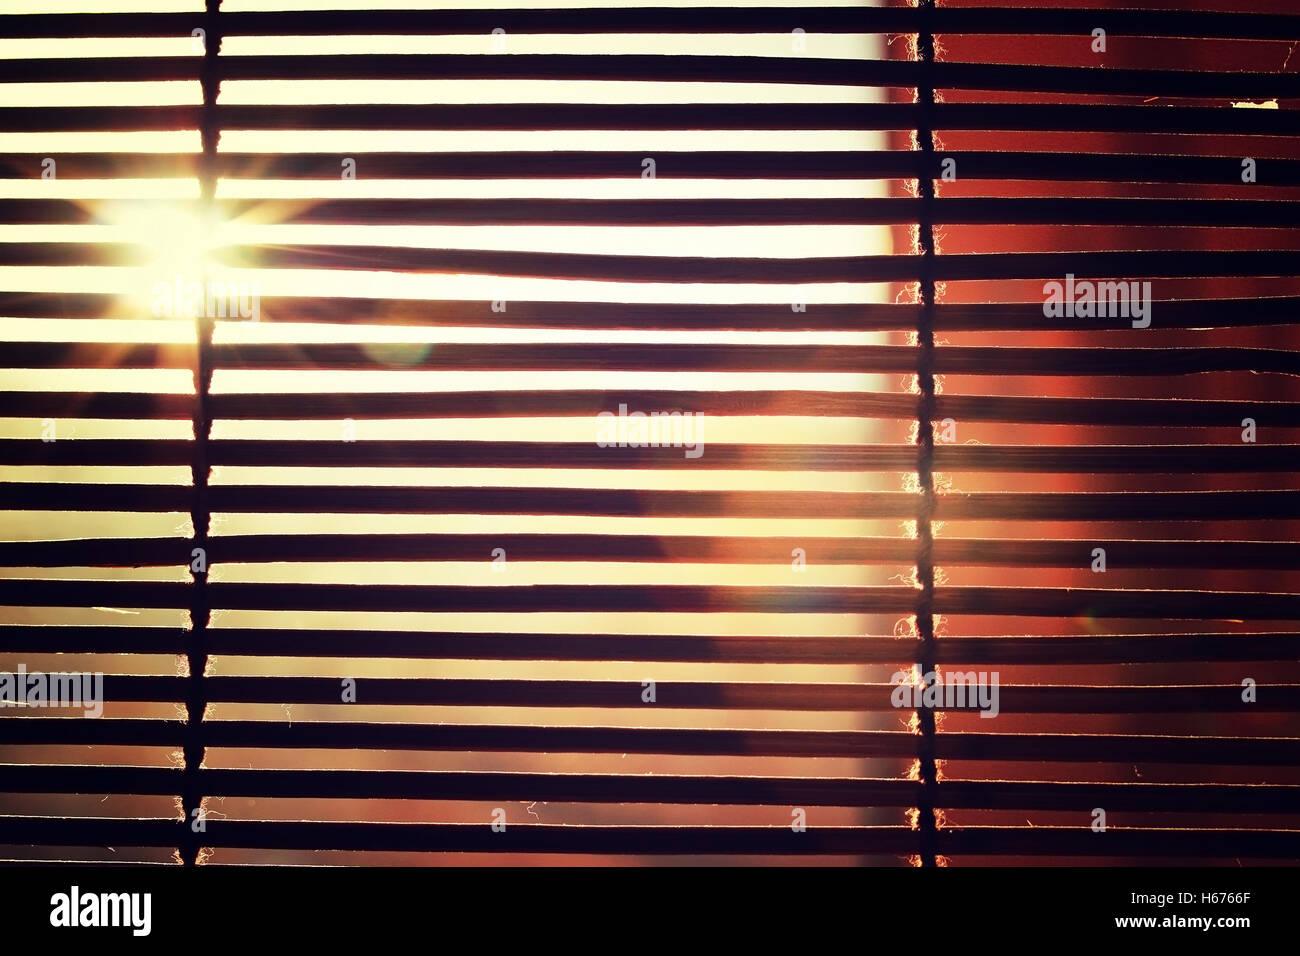 Sun Through Window With Blinds Stock Photos Amp Sun Through